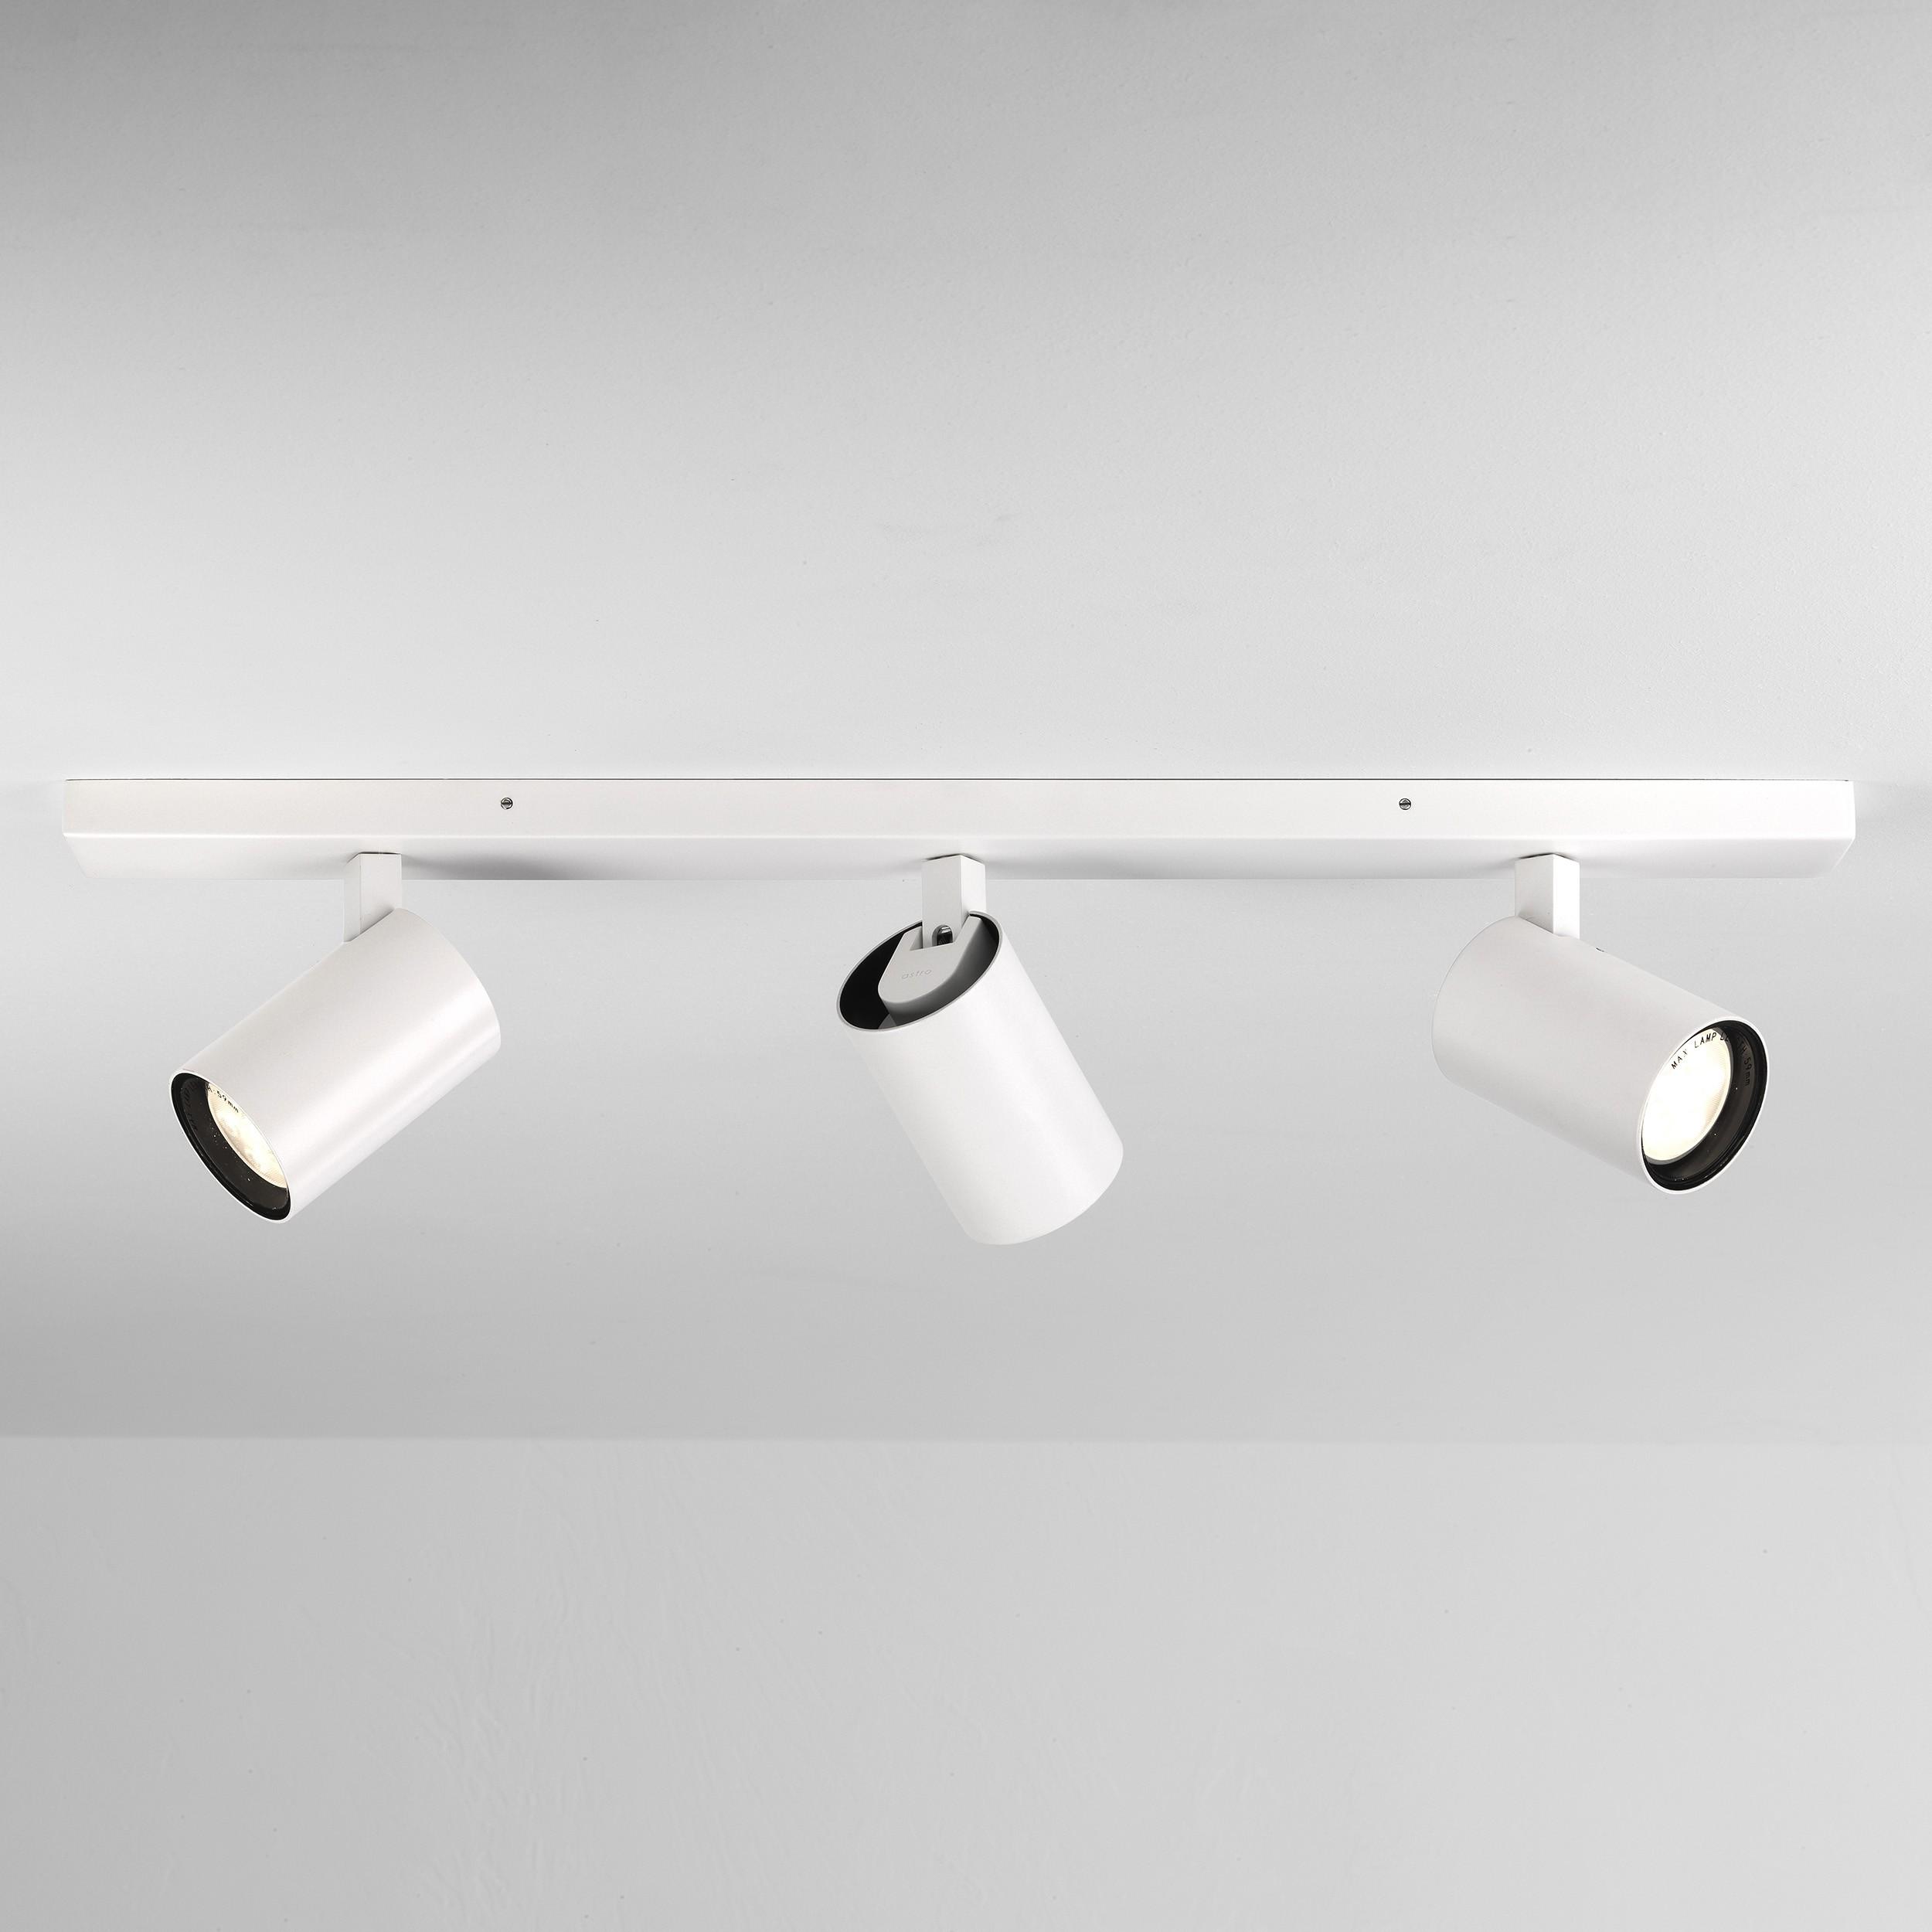 new arrival 50ea9 0dab5 Astro Lighting - Aqua Triple Bar 1393003 (6154) - IP44 Matt White Spotlight